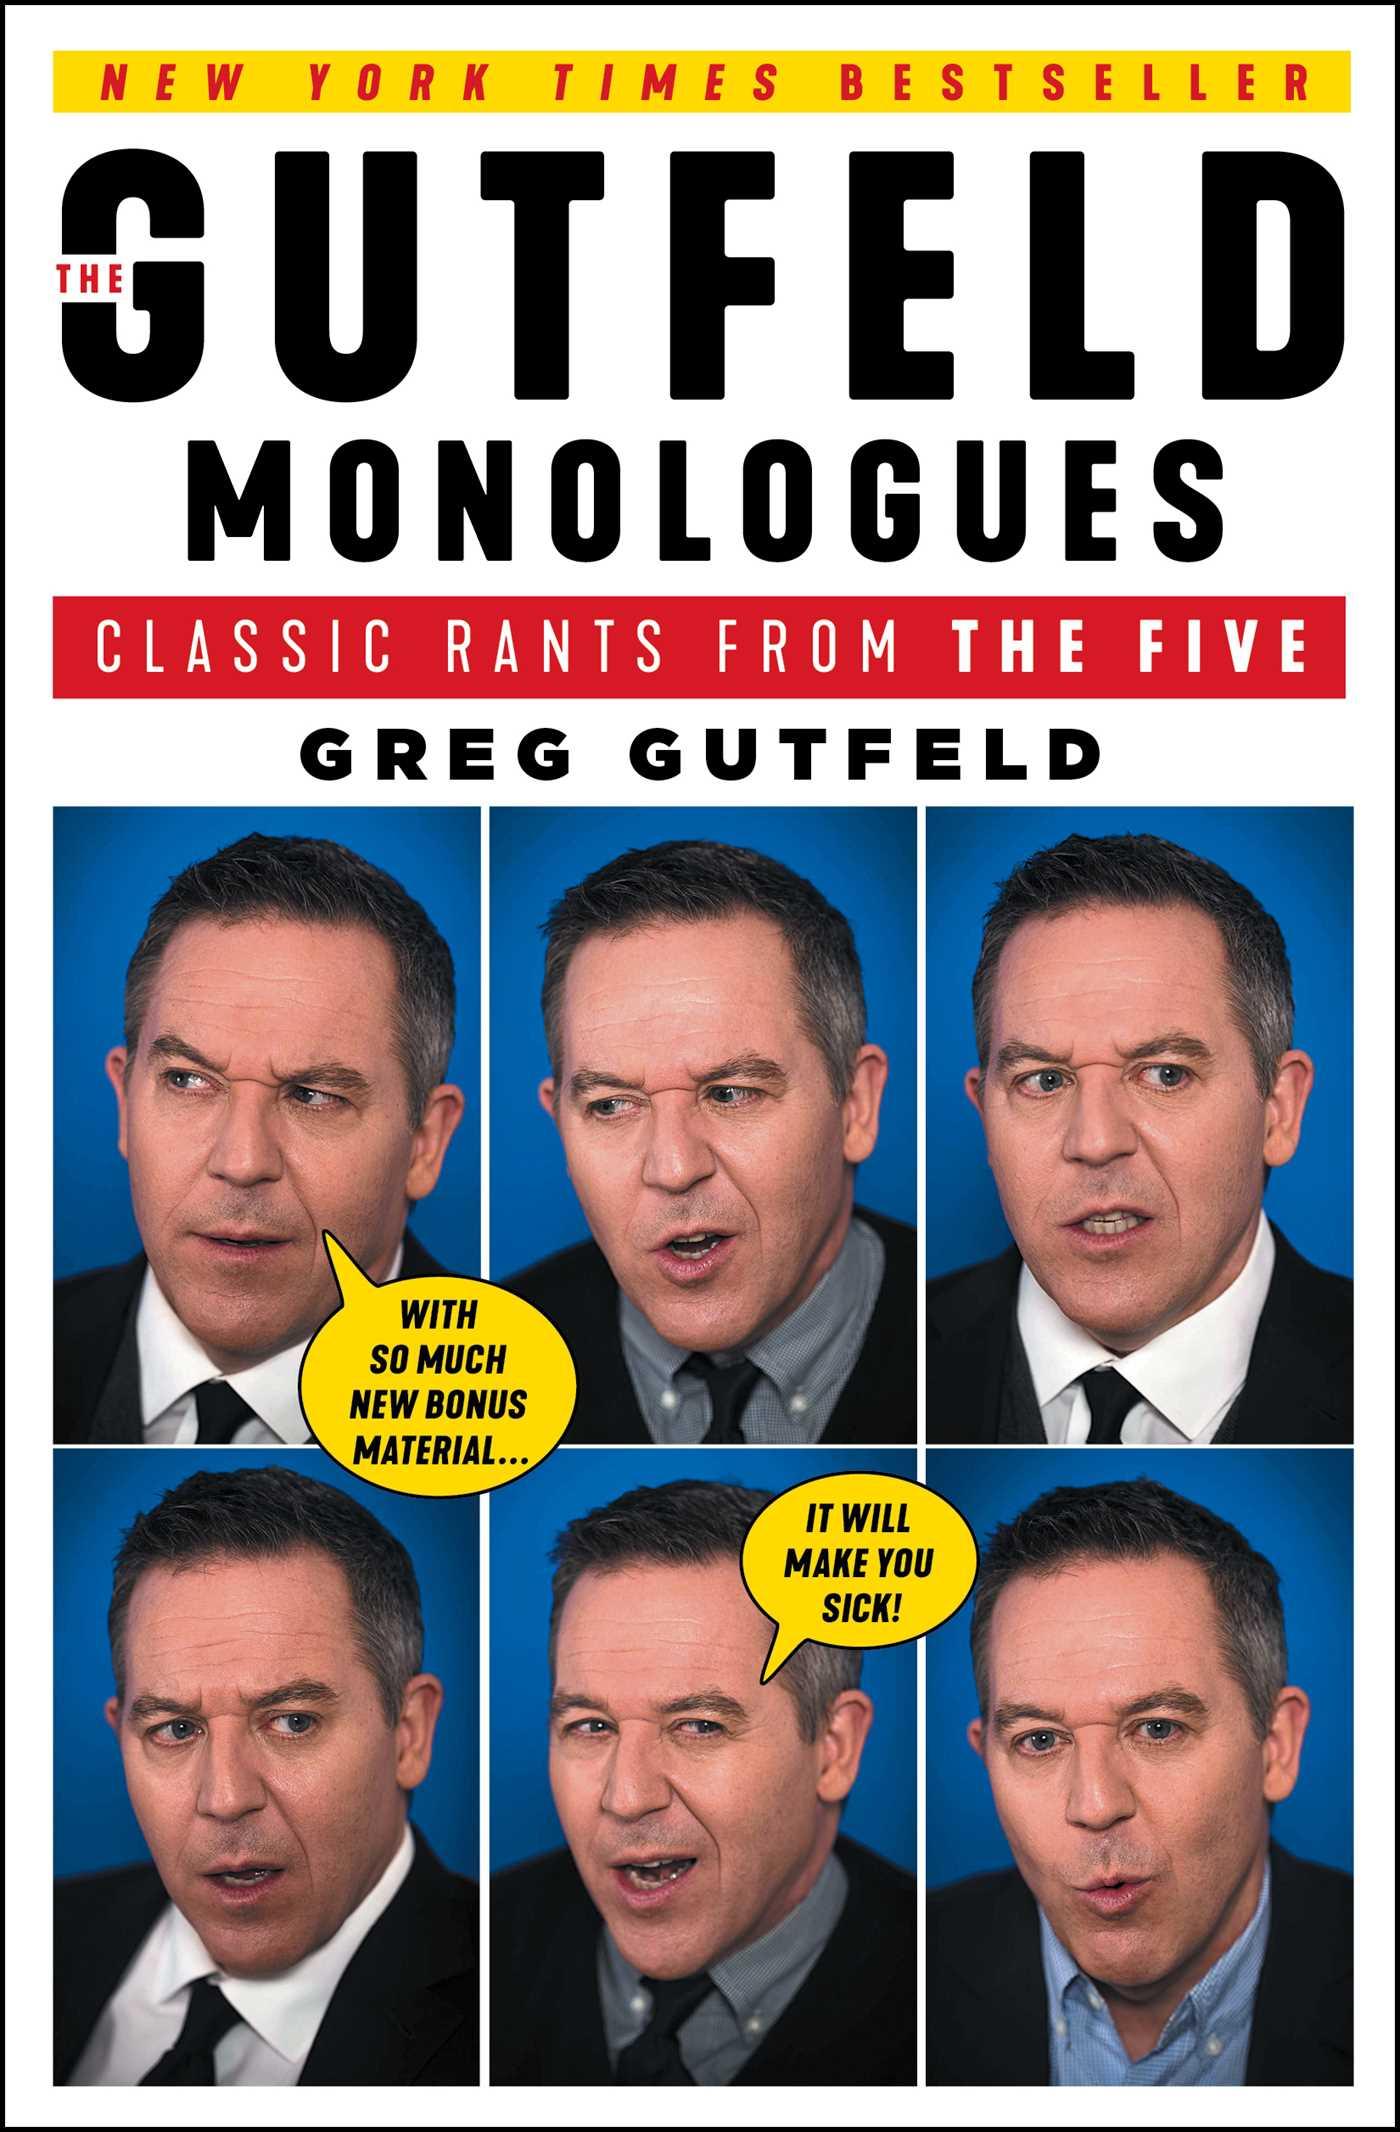 The Gutfeld Monologues | Book by Greg Gutfeld | Official